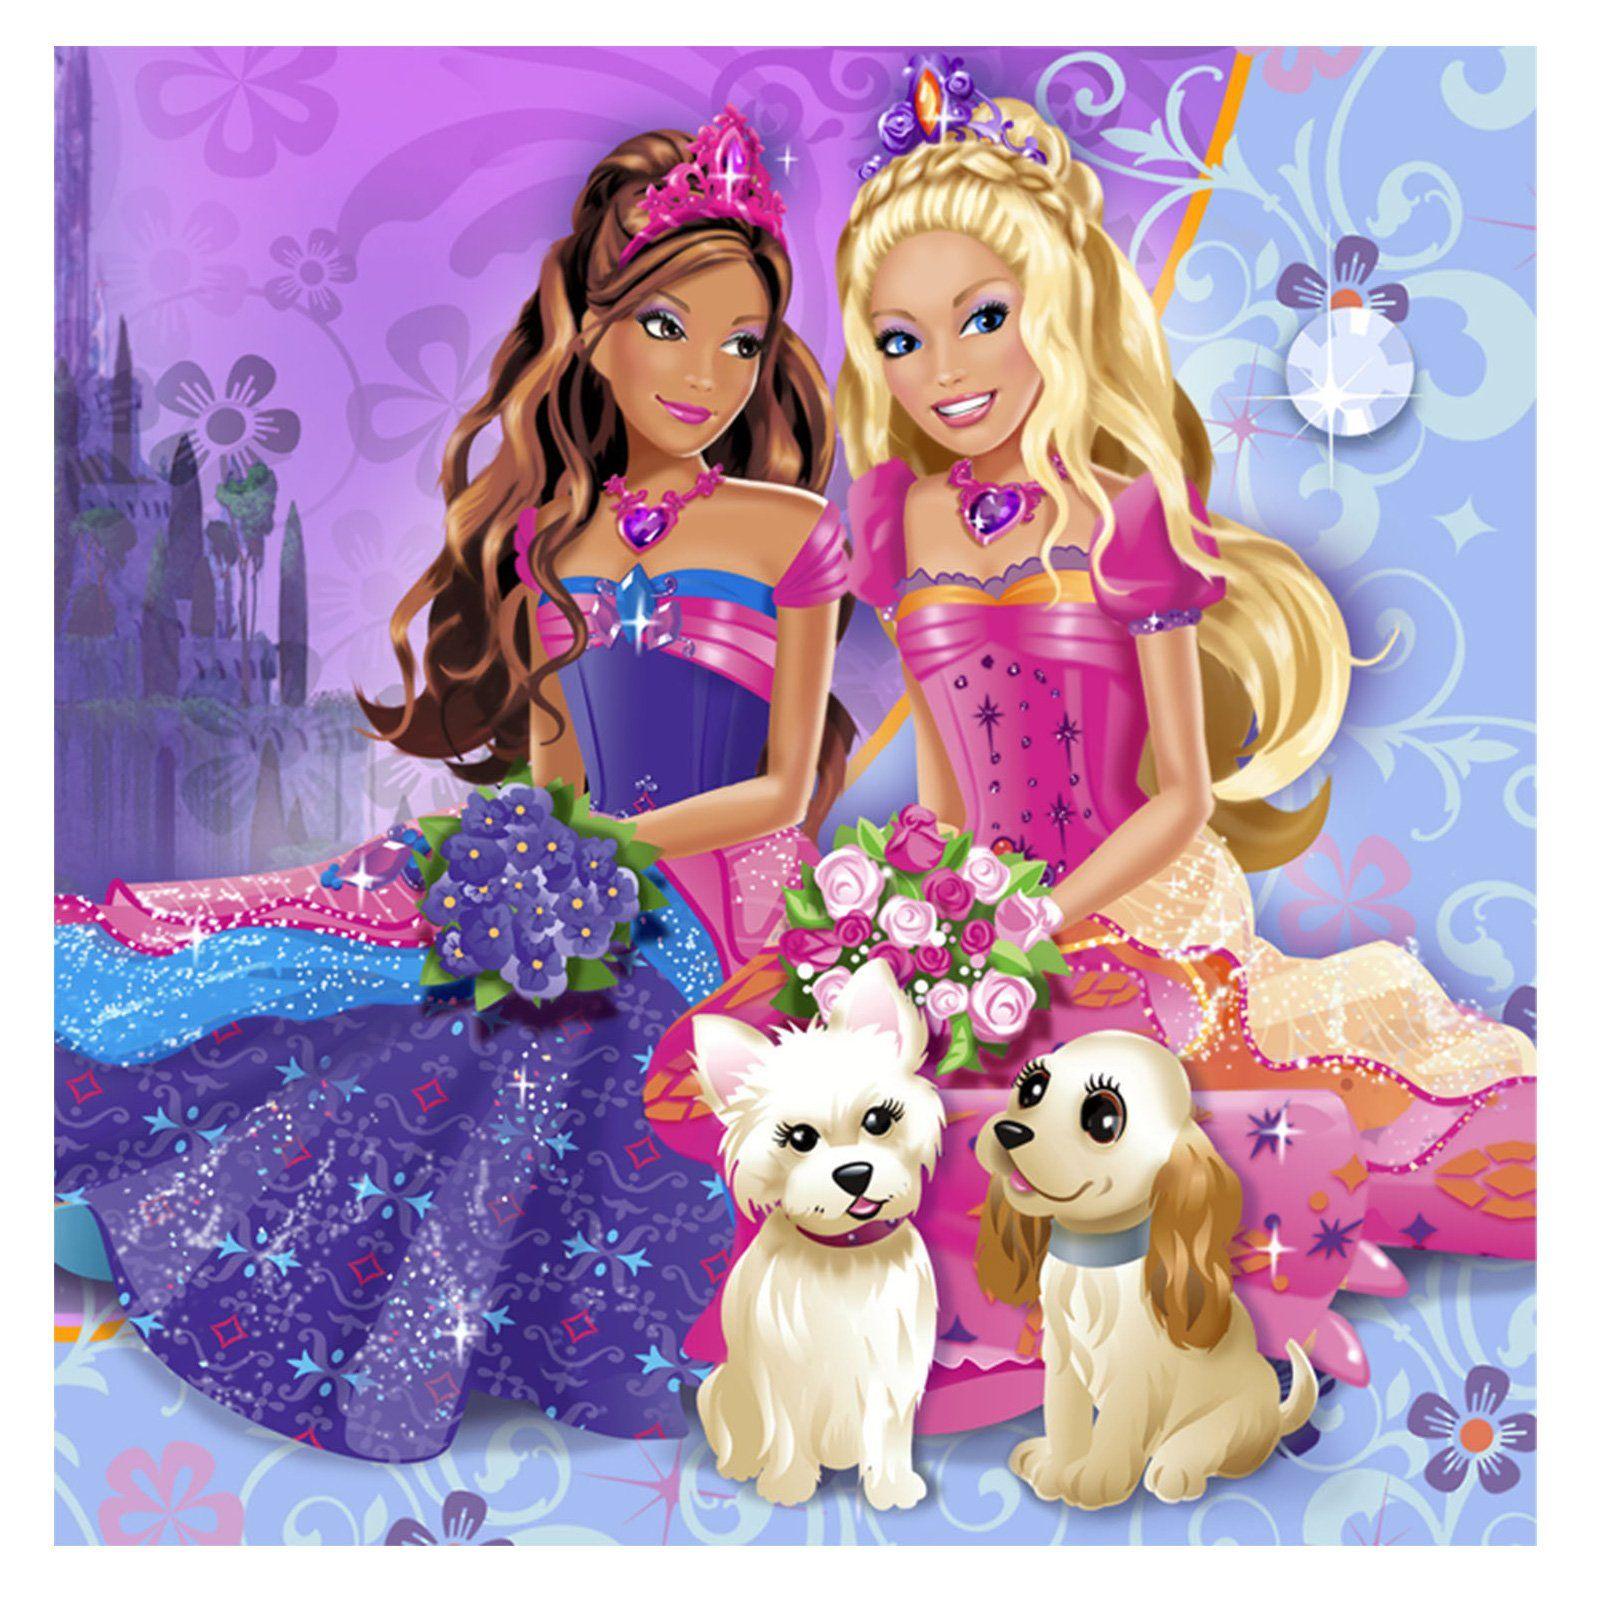 barbie birthday wallpaper - photo #31